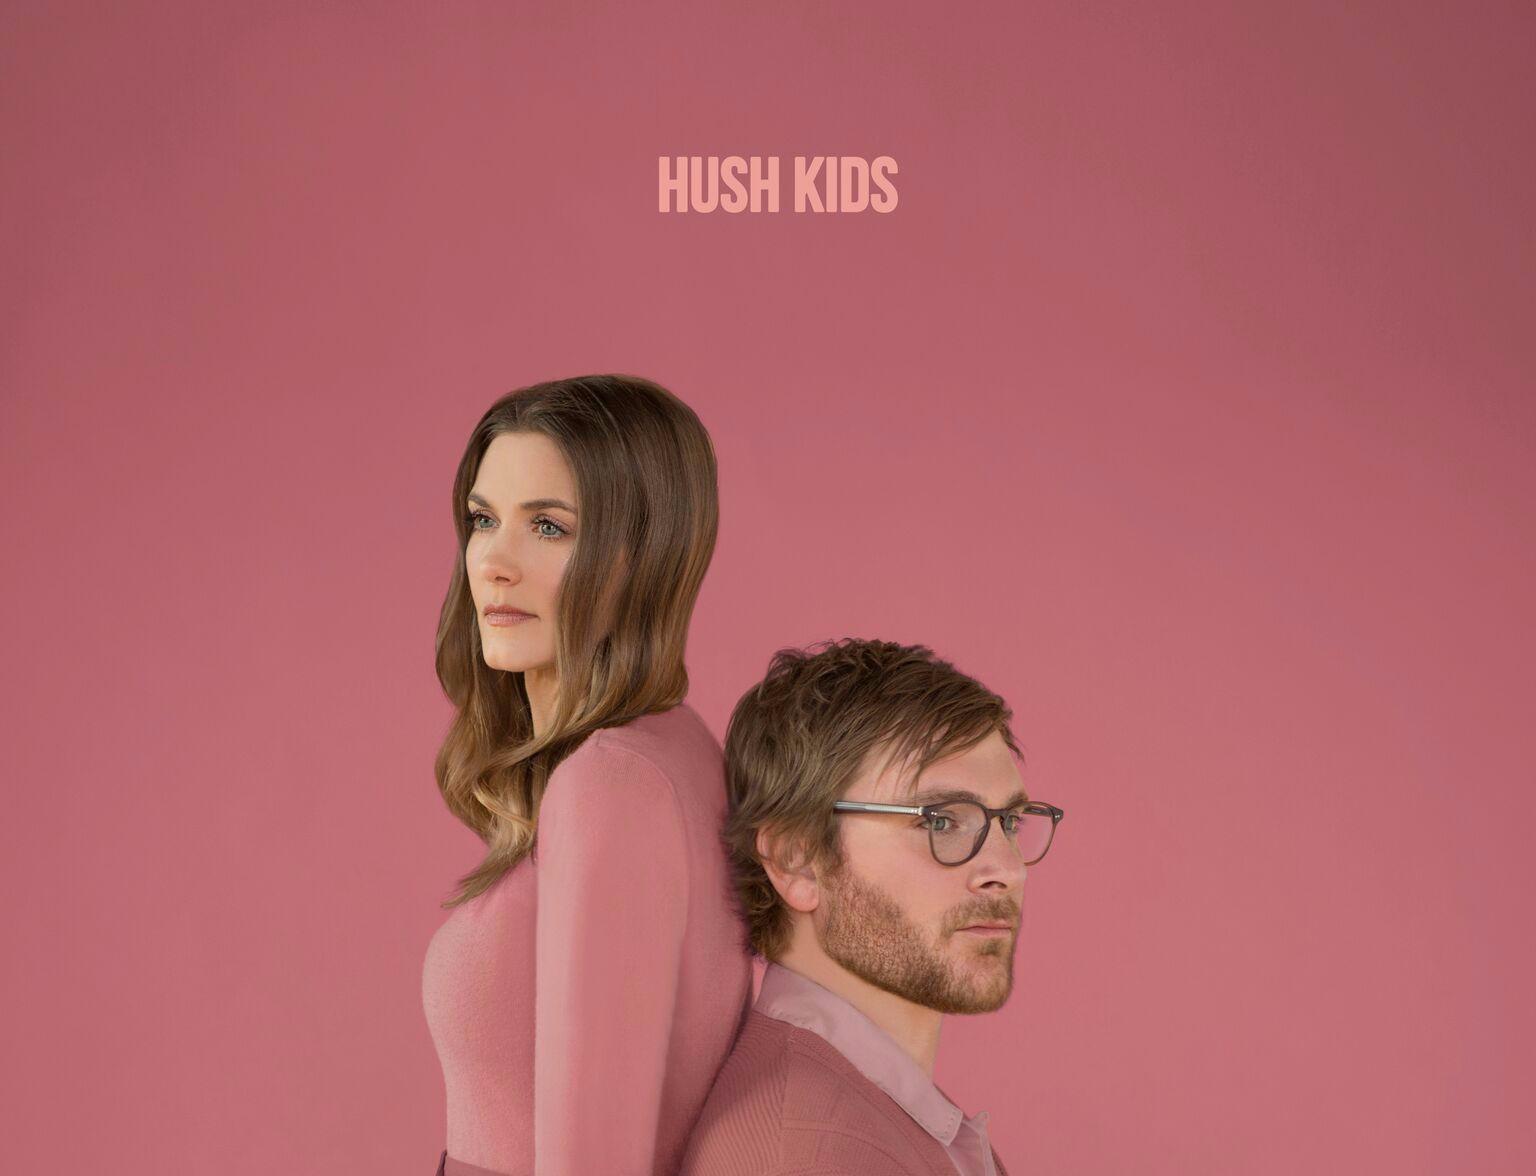 "Love Is A Made Up Word - ""But you and I, we got it rightLove is a made up word""- Hush Kids"